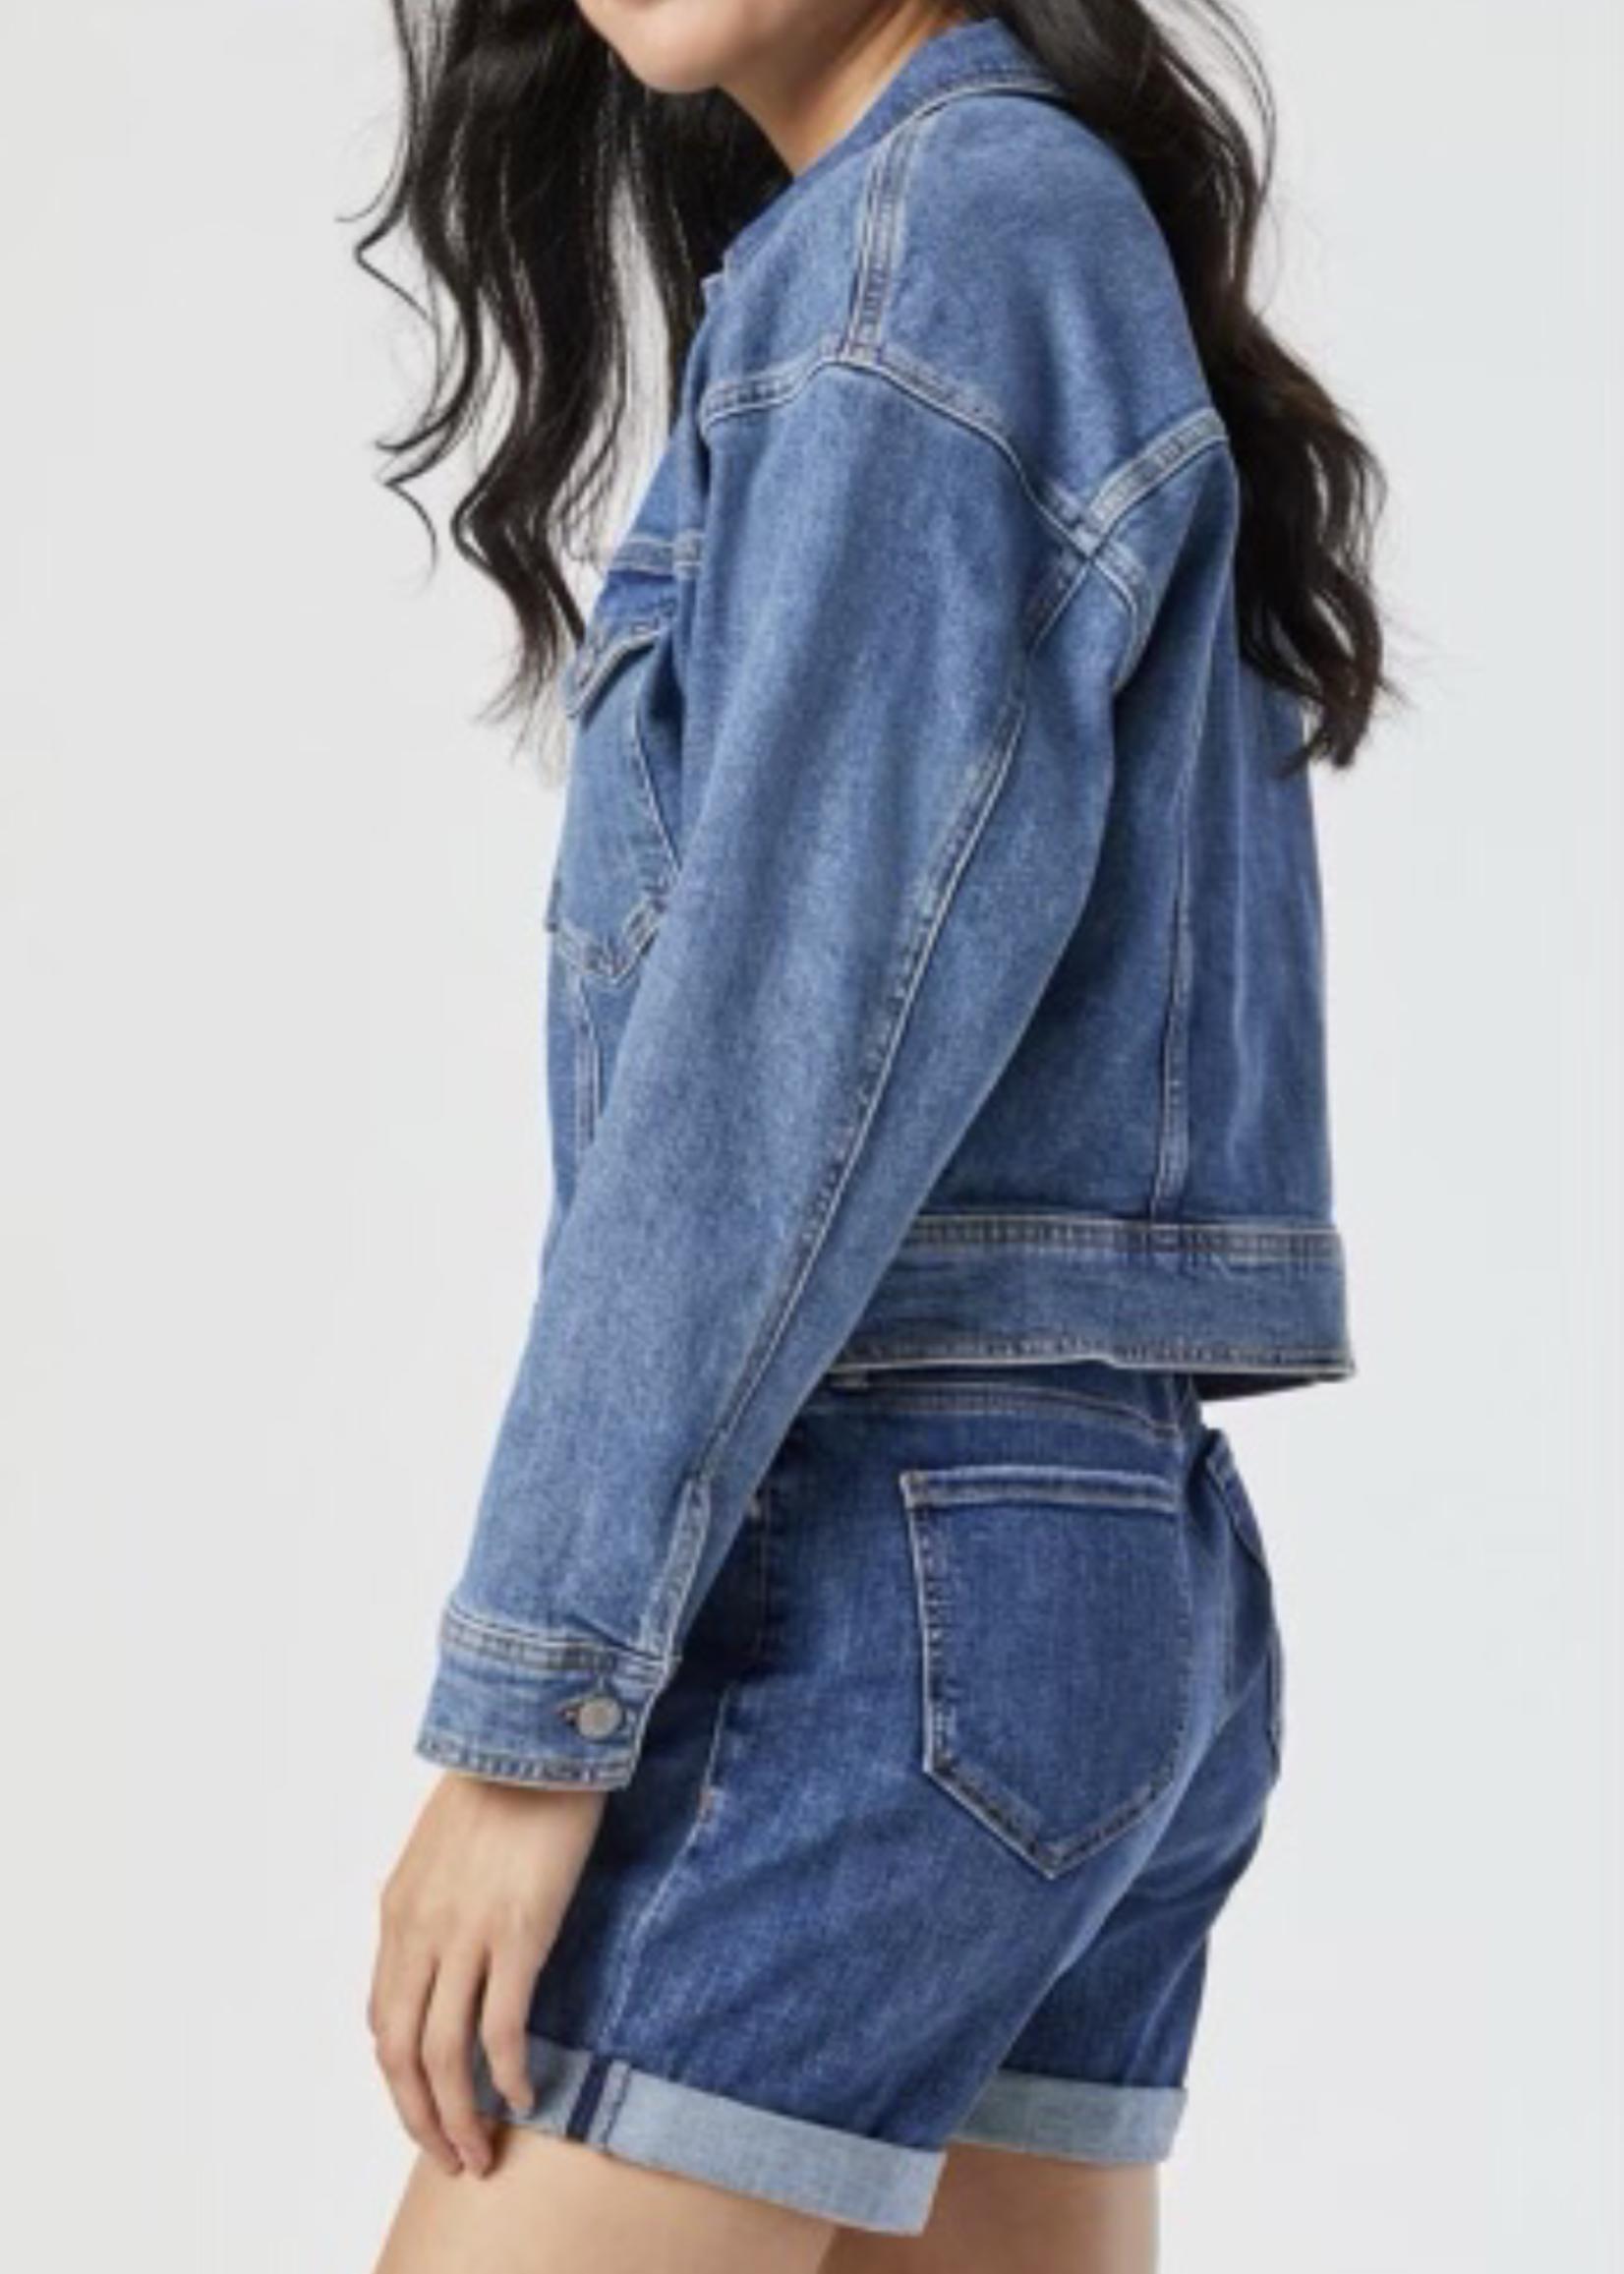 MAVI Jeans Rosa Denim Jacket